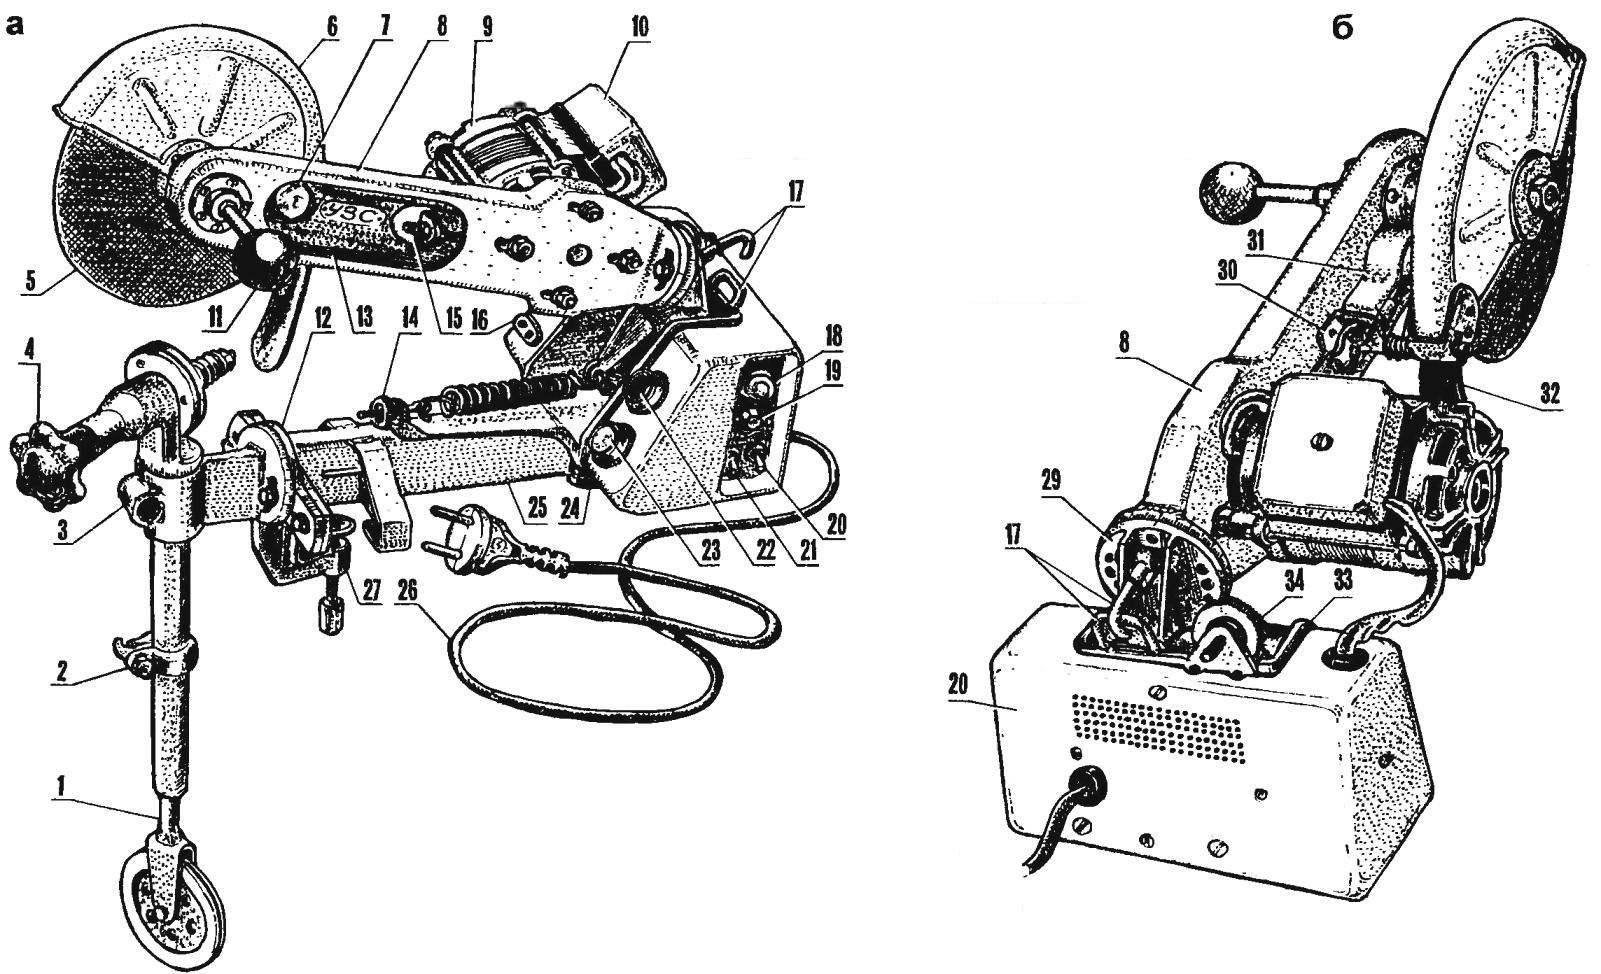 Fig. 1. Universal grinding machine